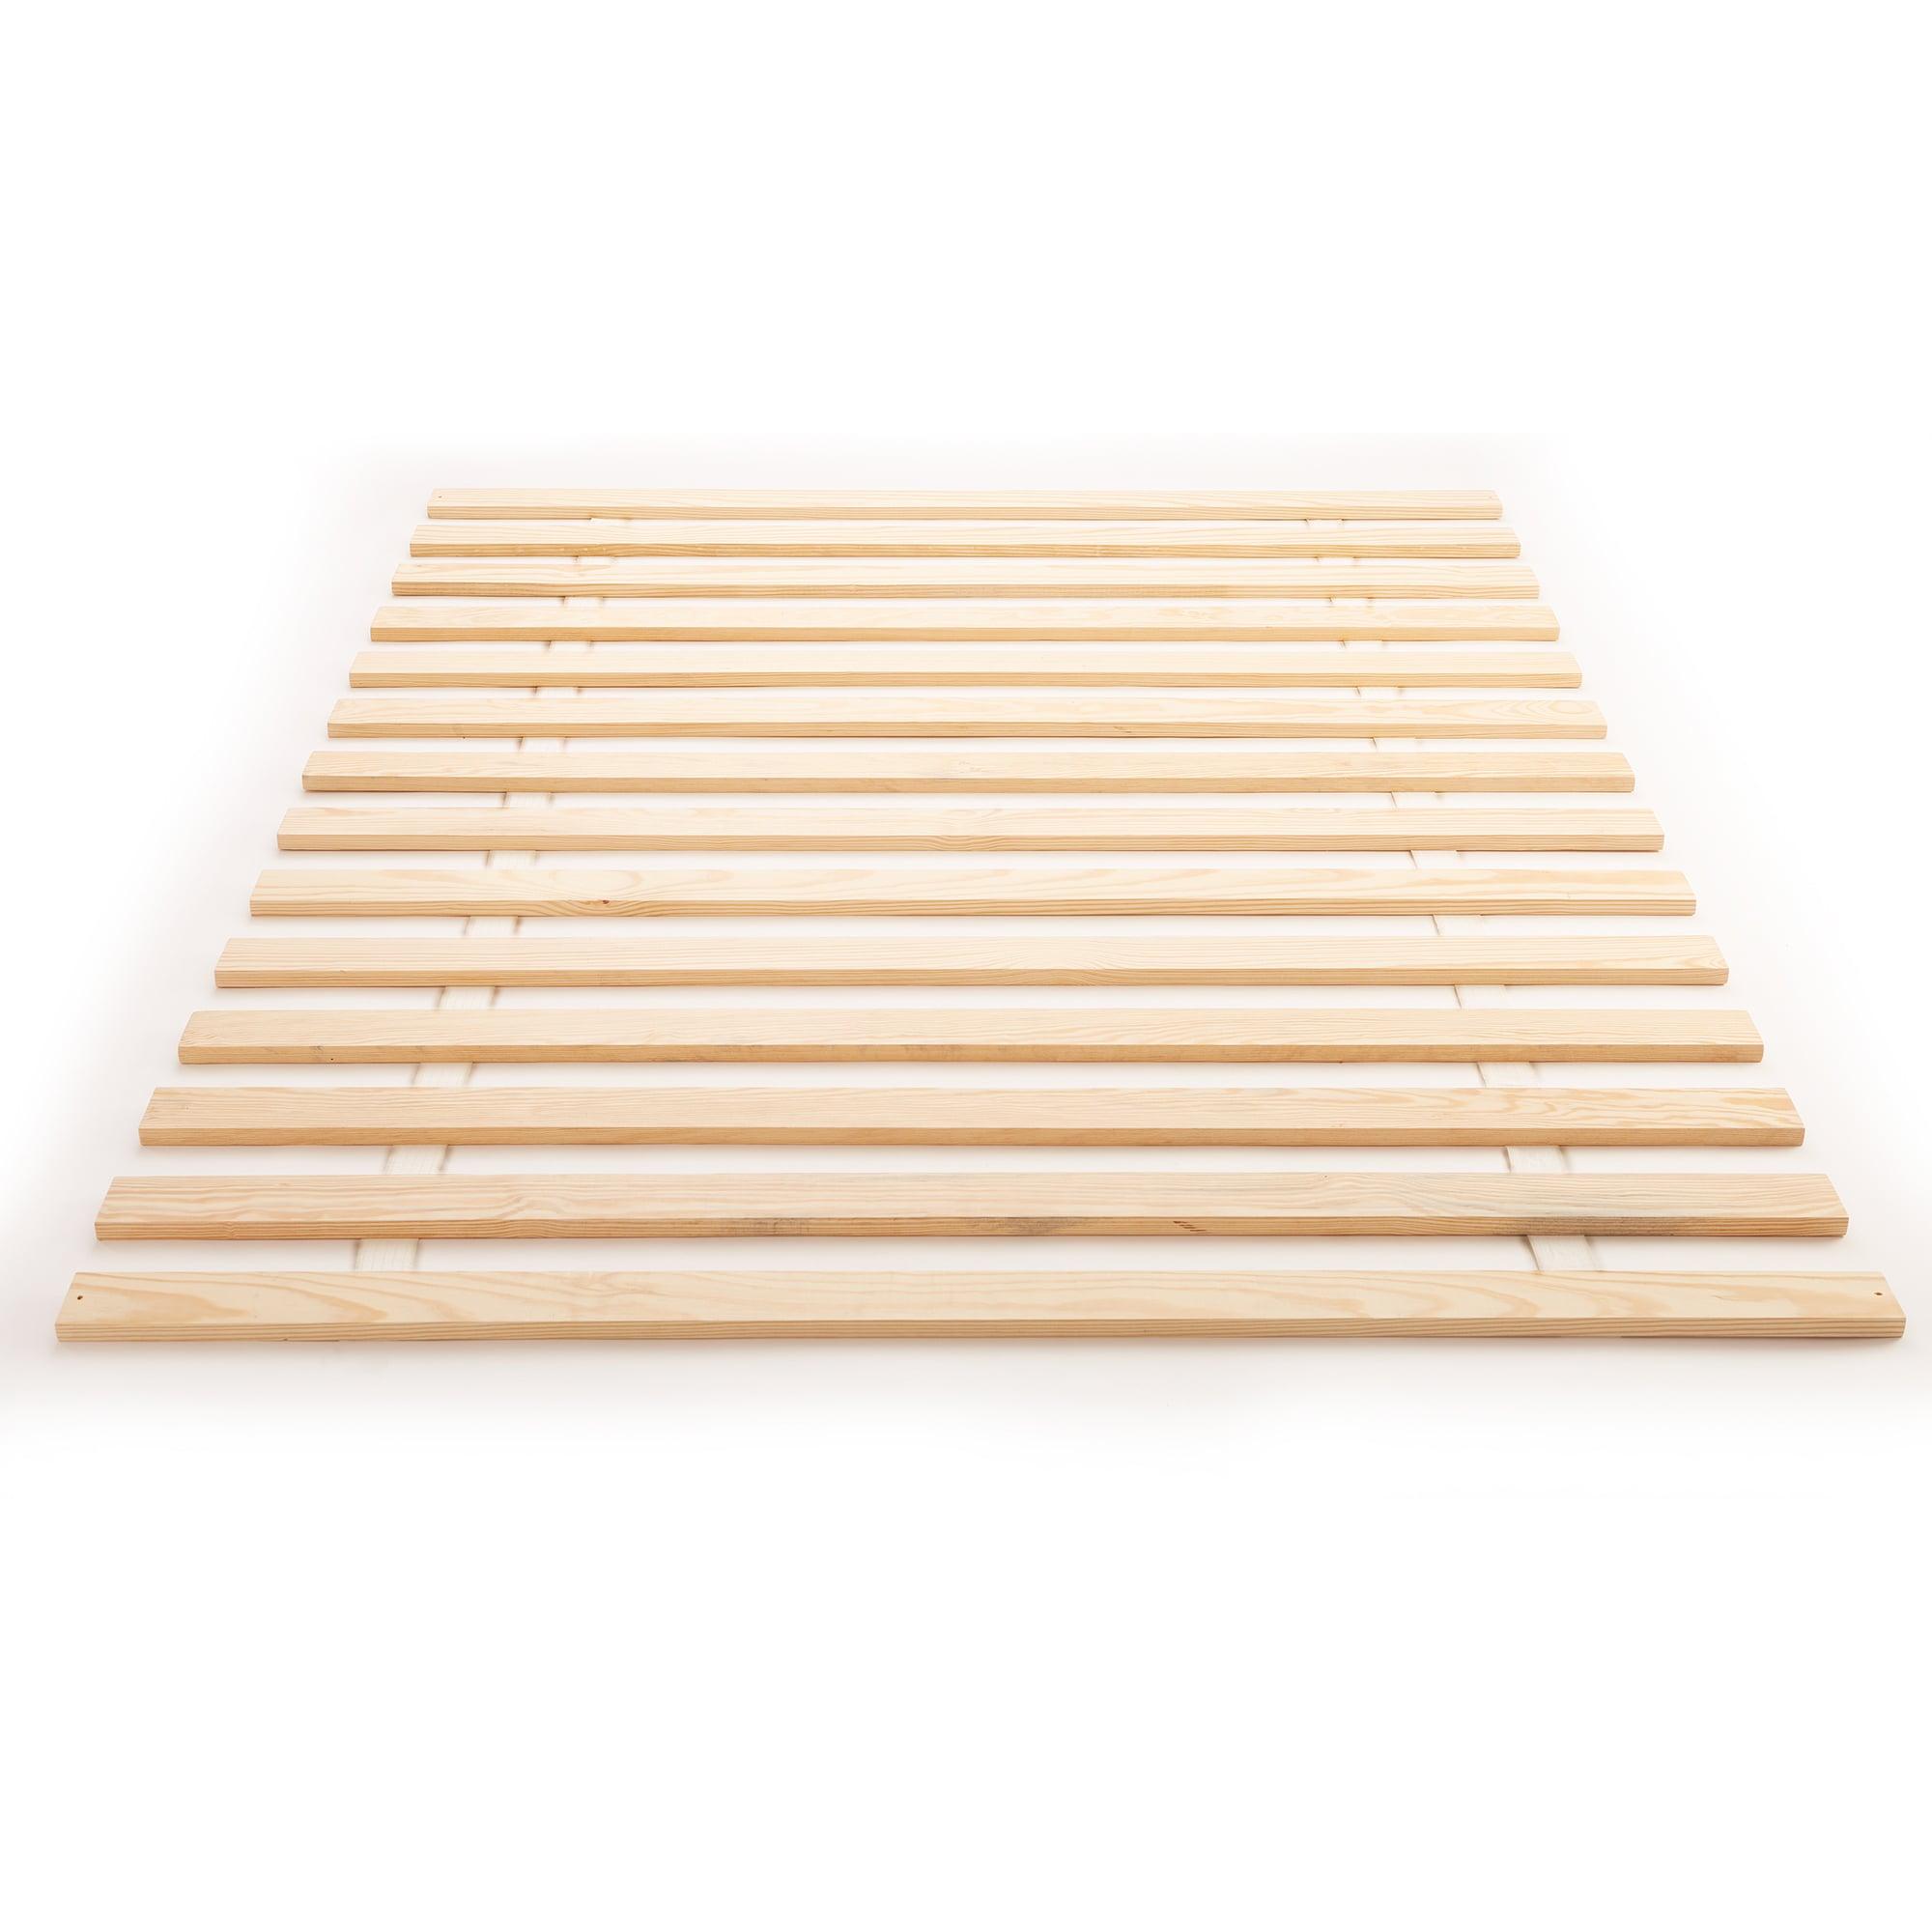 Diy Bathroom Shelf Ideas, Shop Black Friday Deals On Classic Brands Super Heavy Duty Wide Wood Bed Slats On Sale Overstock 24322917